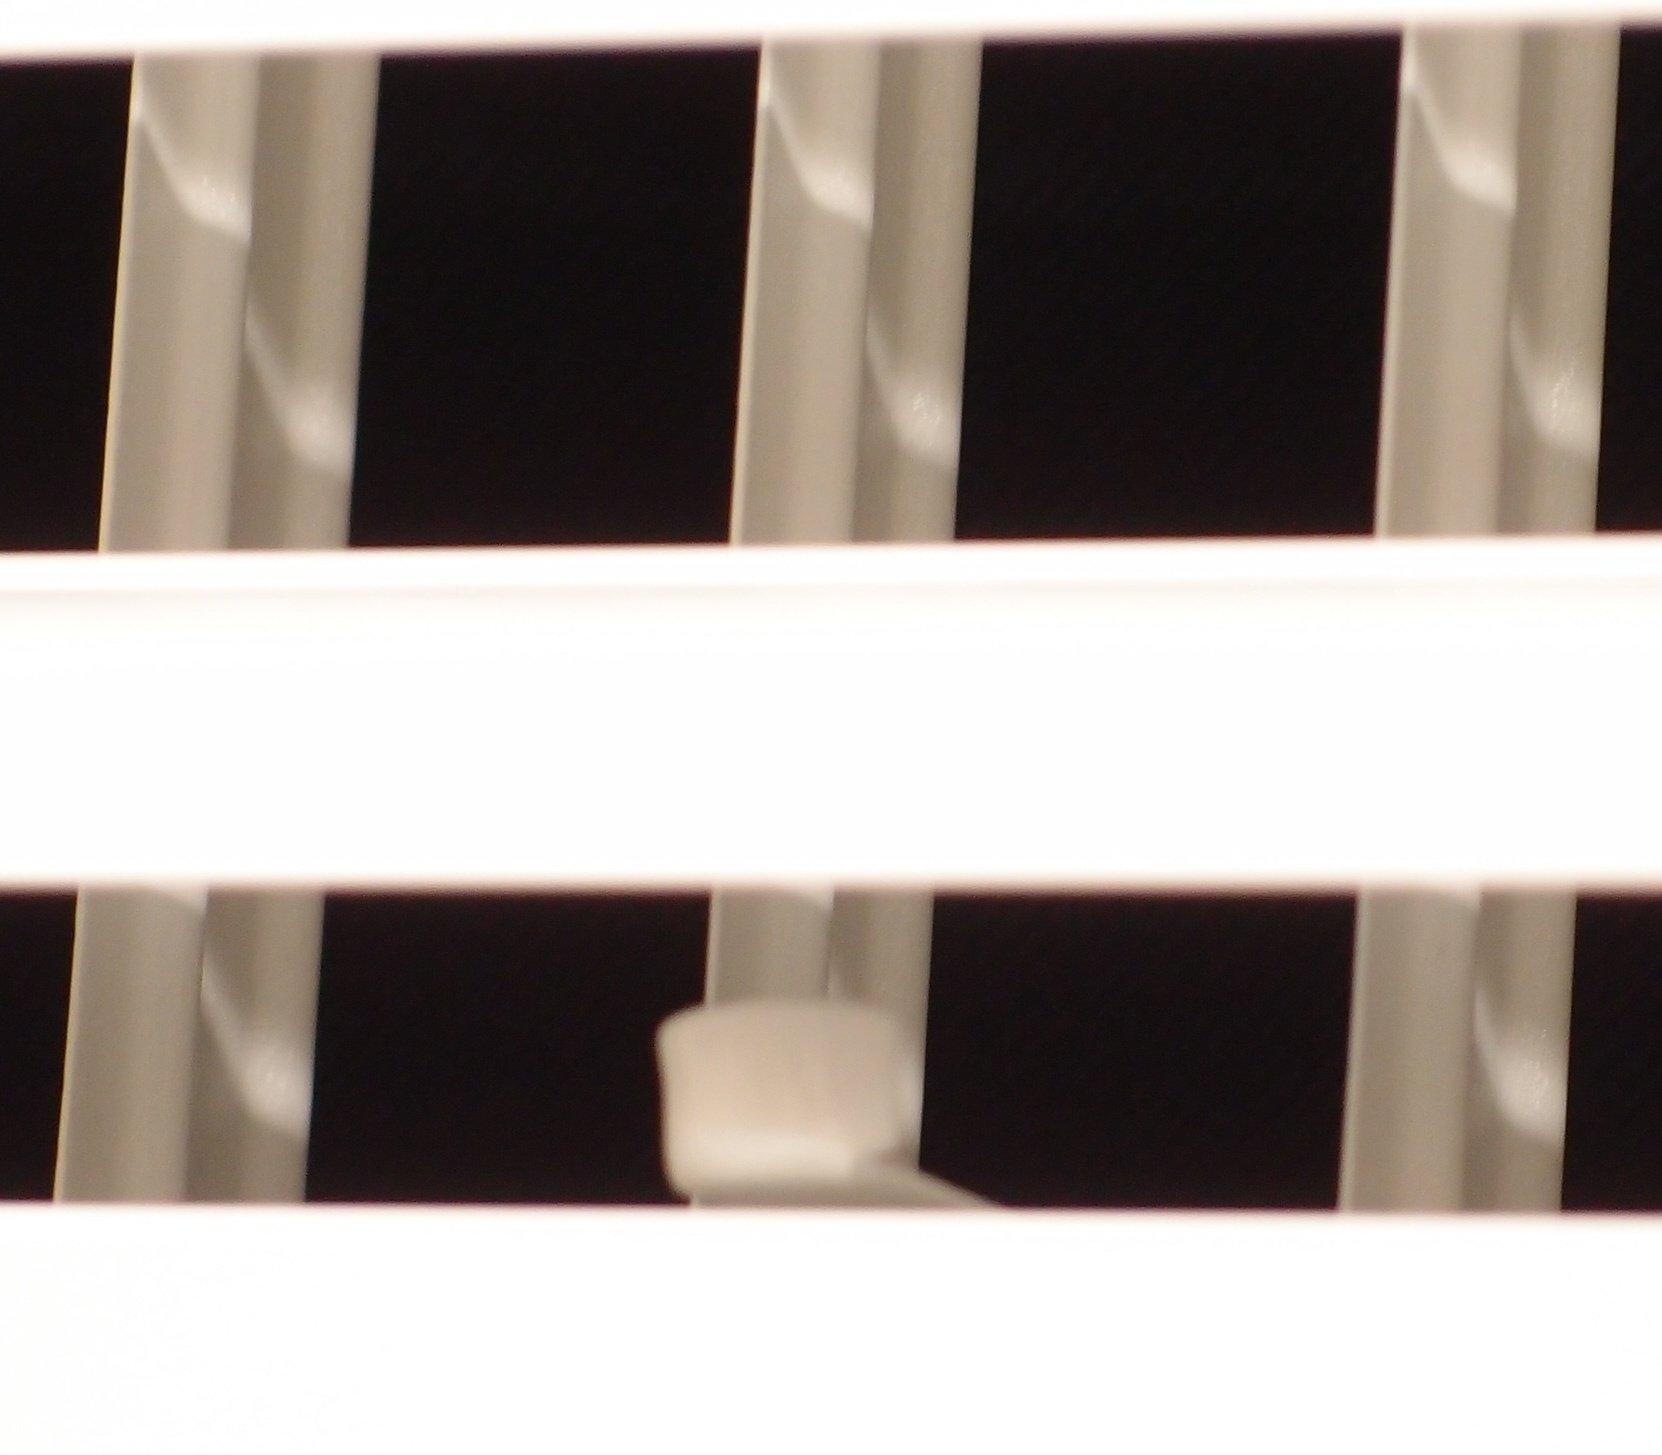 12'' x 6'' - 1-Way Air Vent - Adjustable Aluminum Curved Blades - Maximum Air Flow - HVAC Grille by HVAC Premium (Image #3)